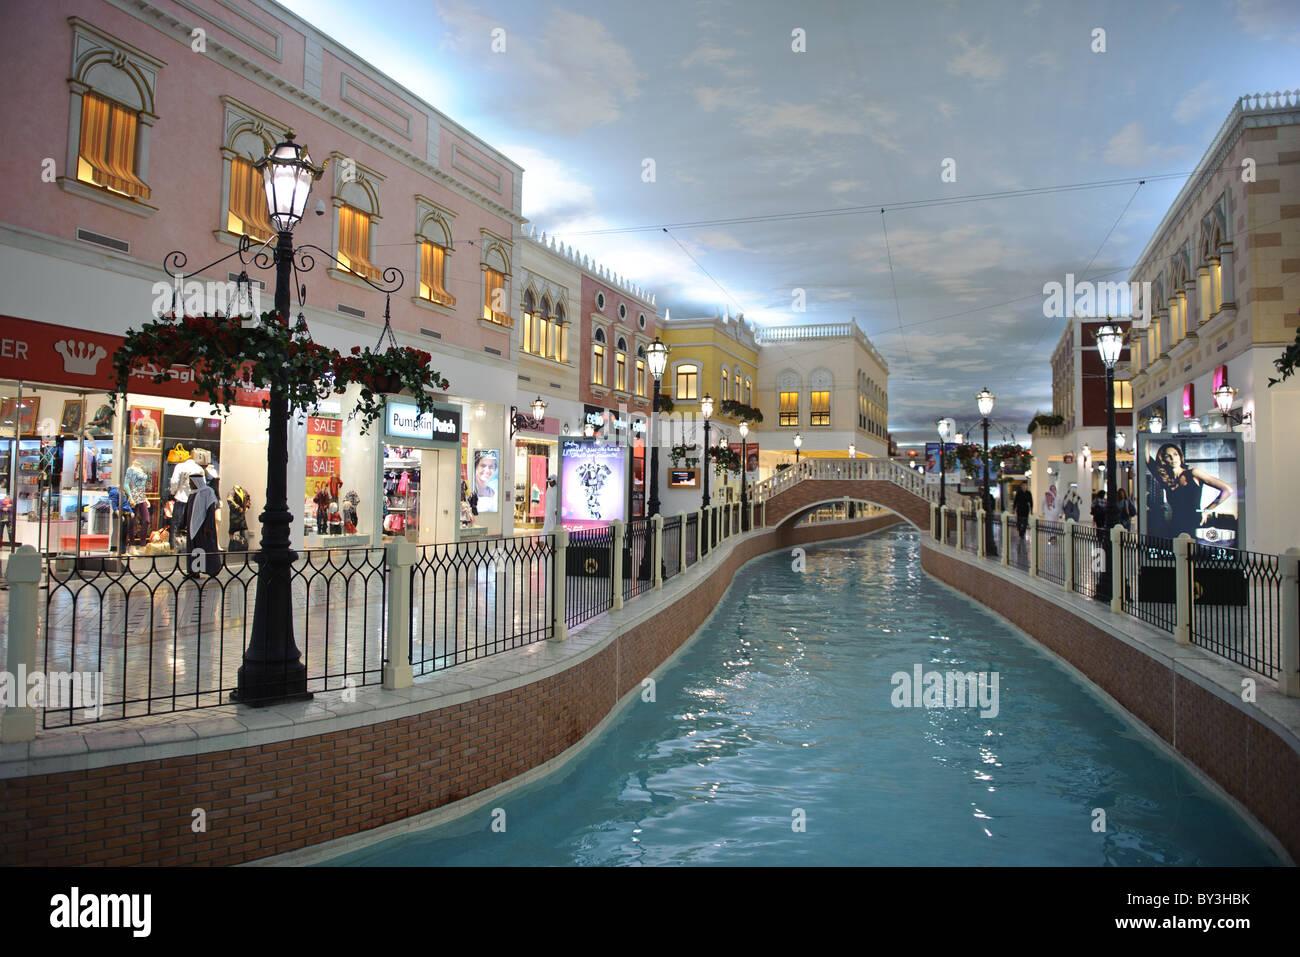 Doha City Shopping Centre